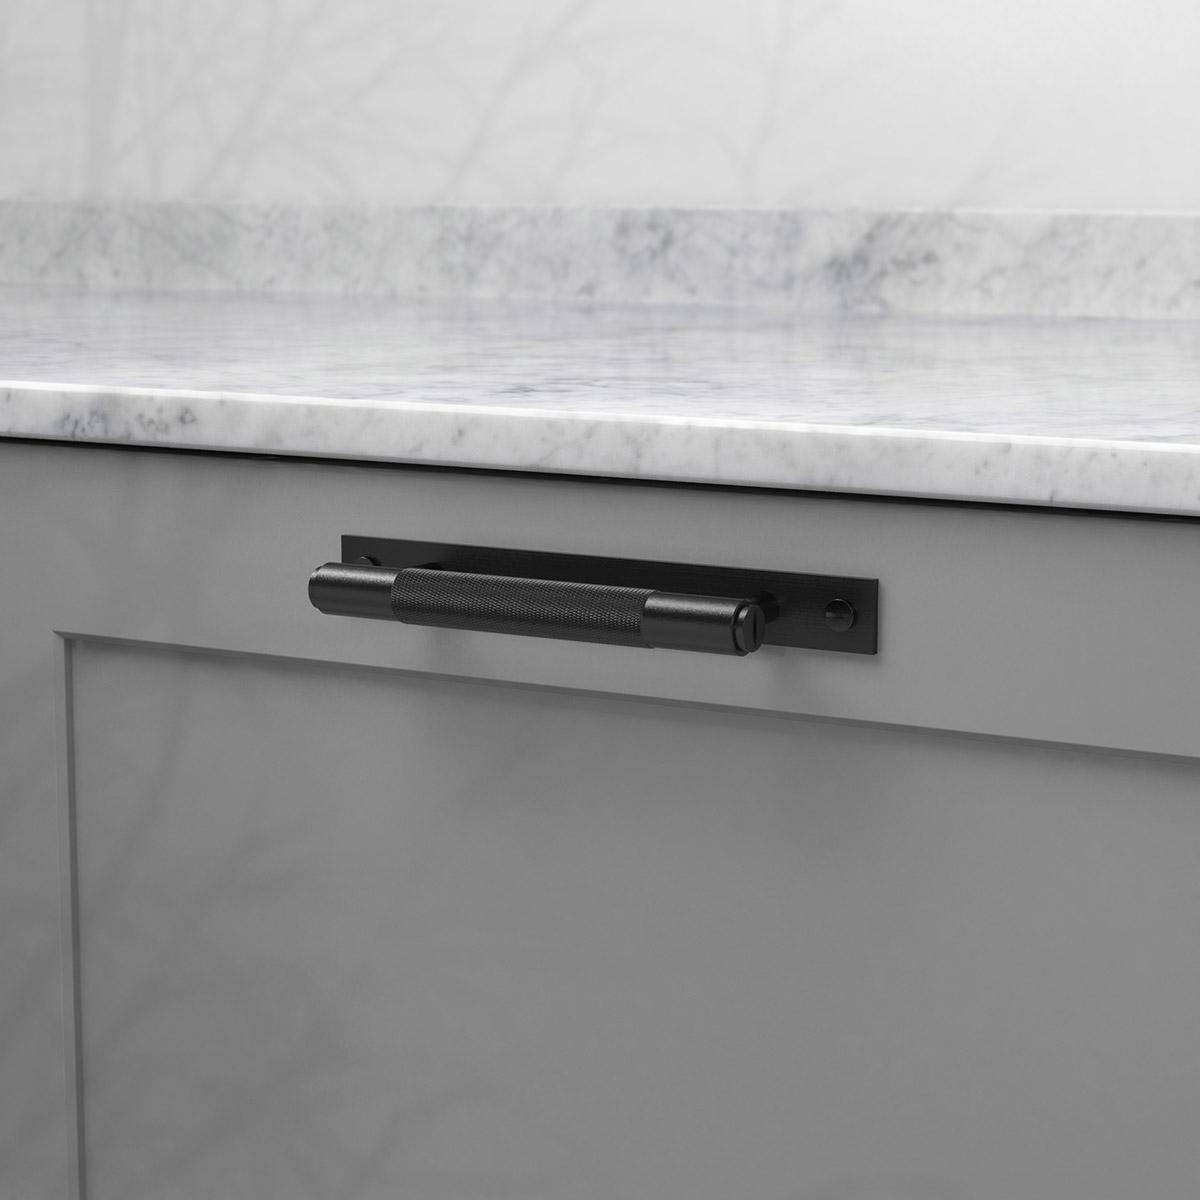 pull bar plate svart uk pb hp 160 bl a cc 125 mm ncs s 4500 n marmor carrara 2